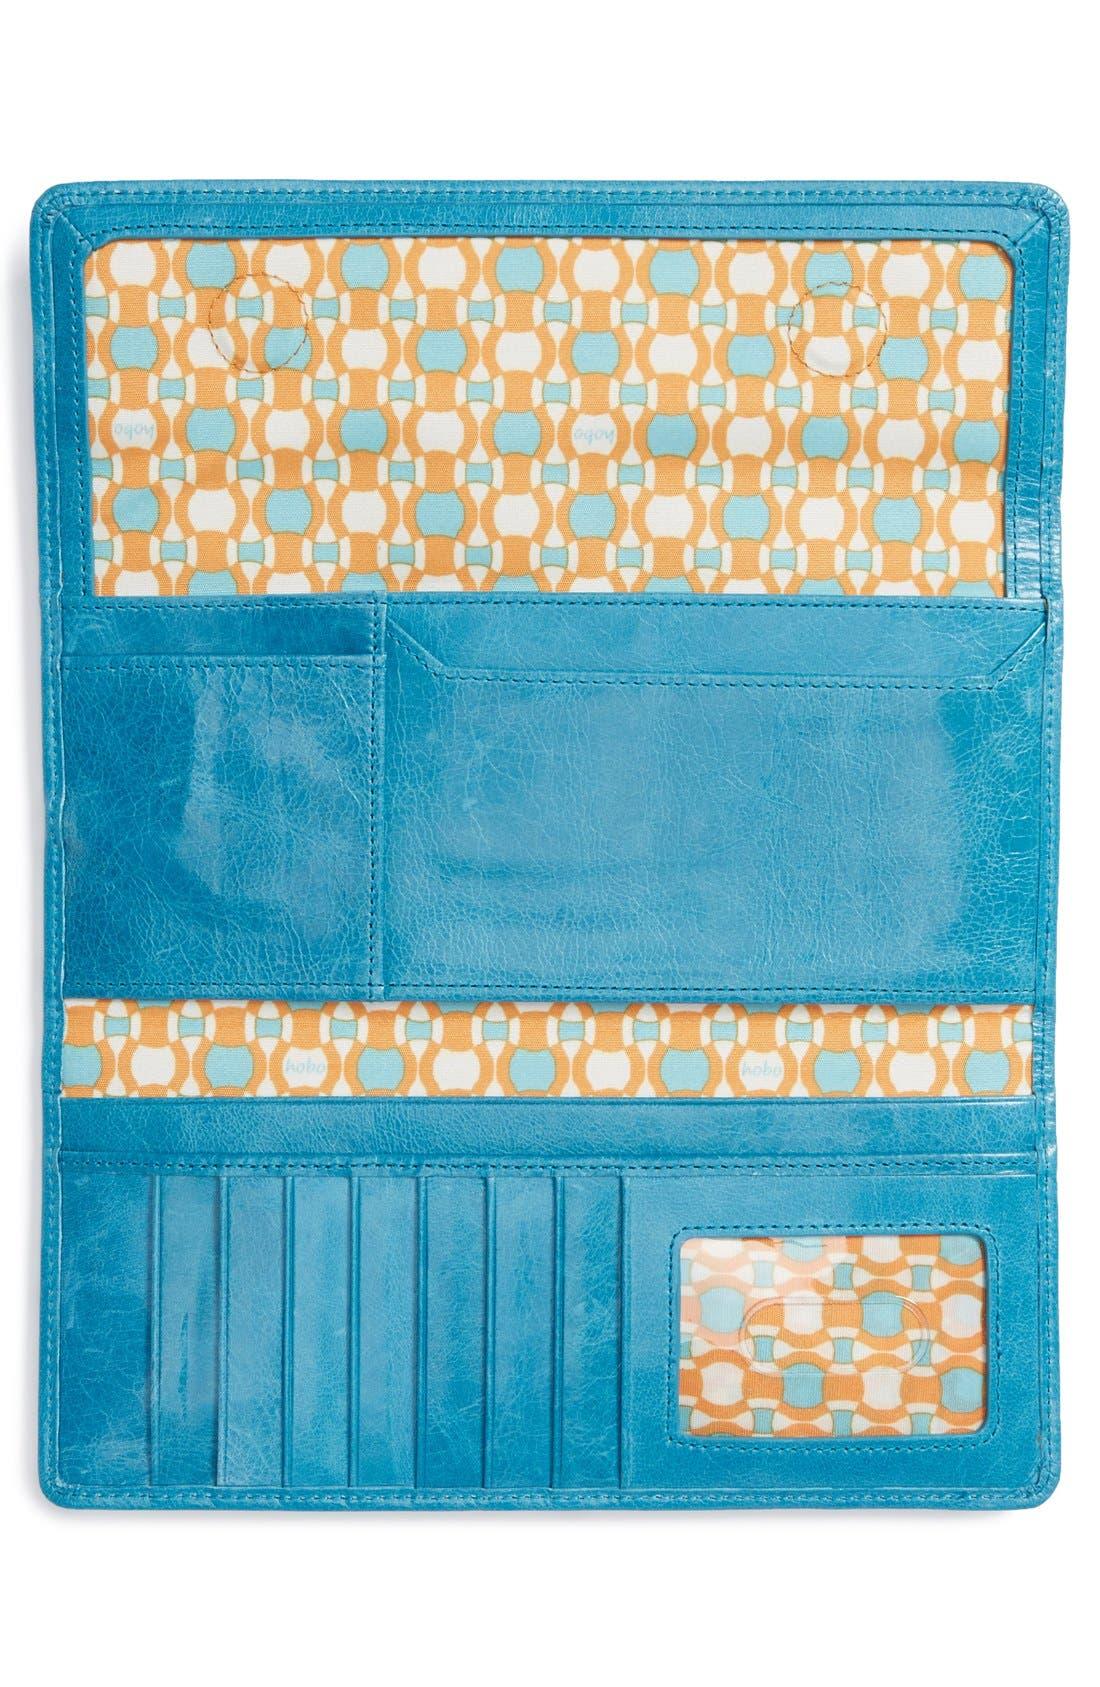 'Sadie' Leather Wallet,                             Alternate thumbnail 91, color,